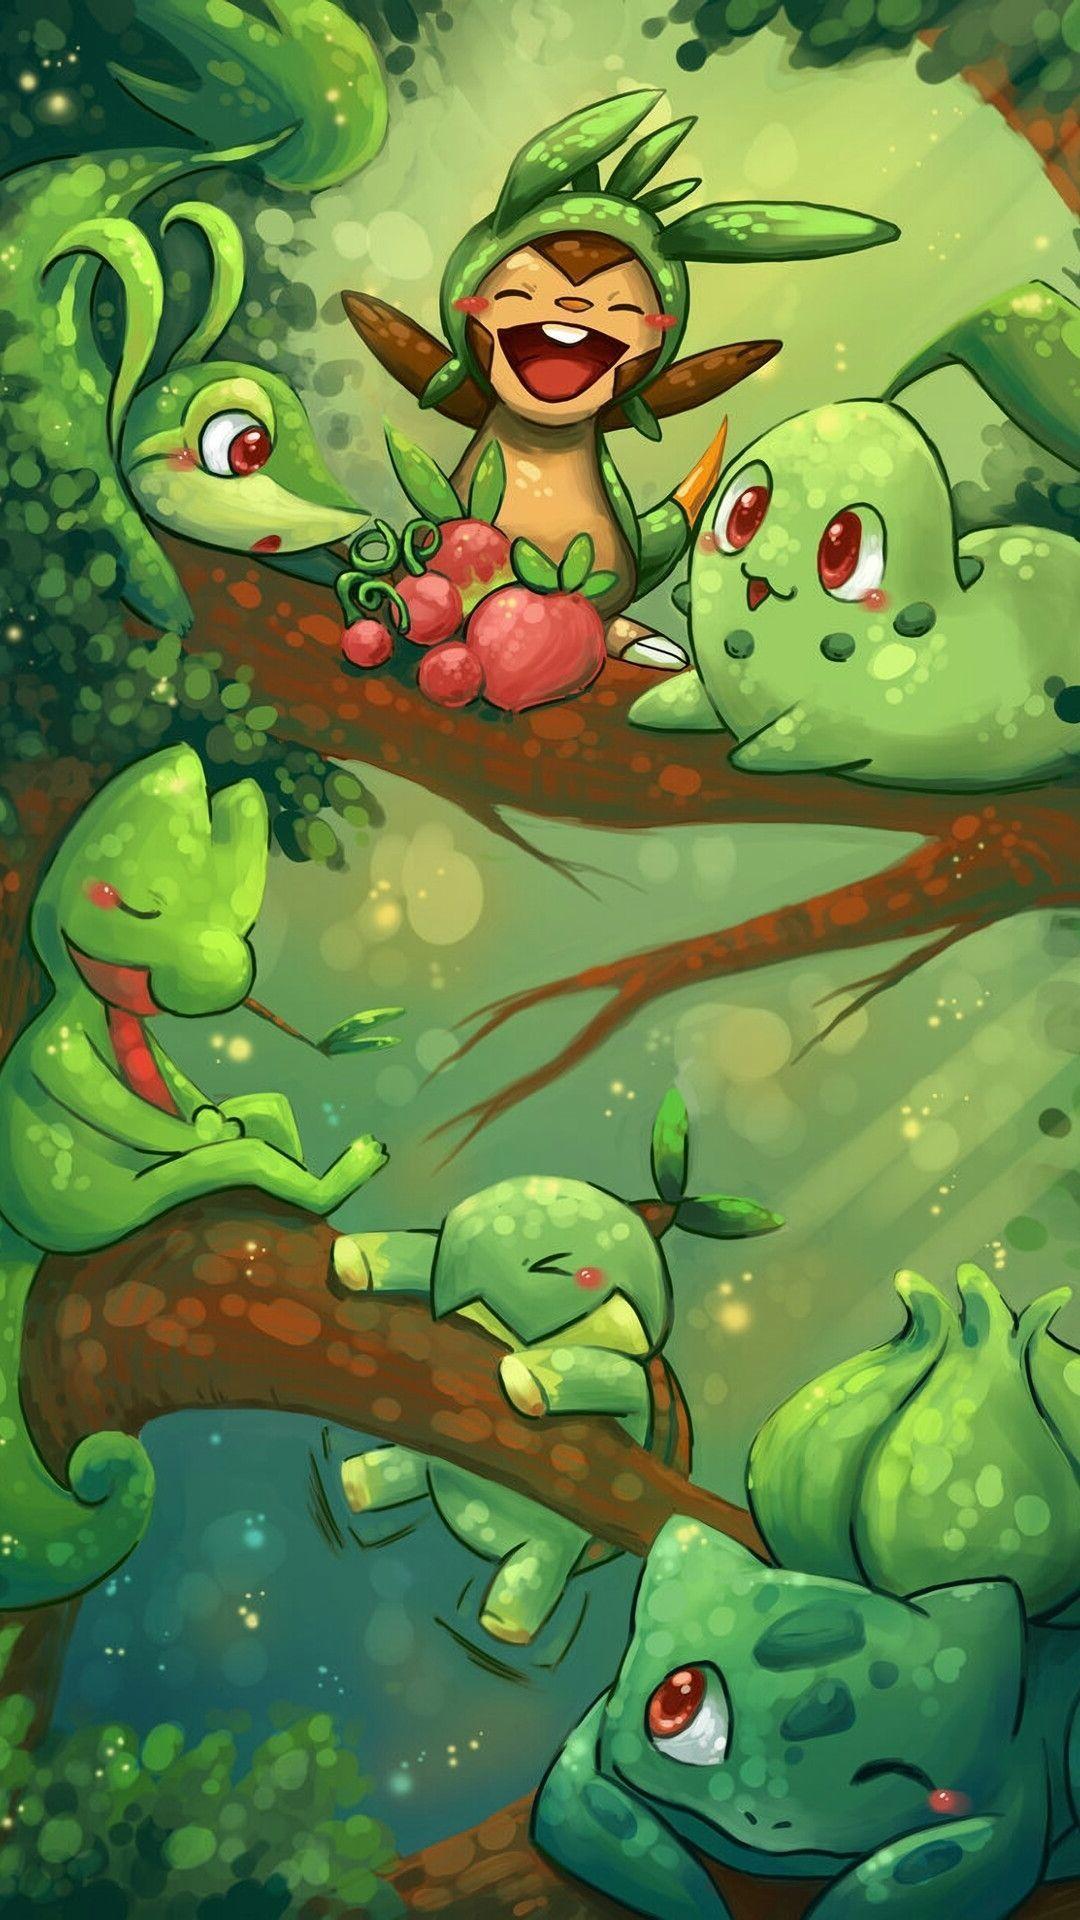 Pokemon Starters Wallpaper : pokemon, starters, wallpaper, Pokemon, Grass, Starters, Wallpaper, Anime